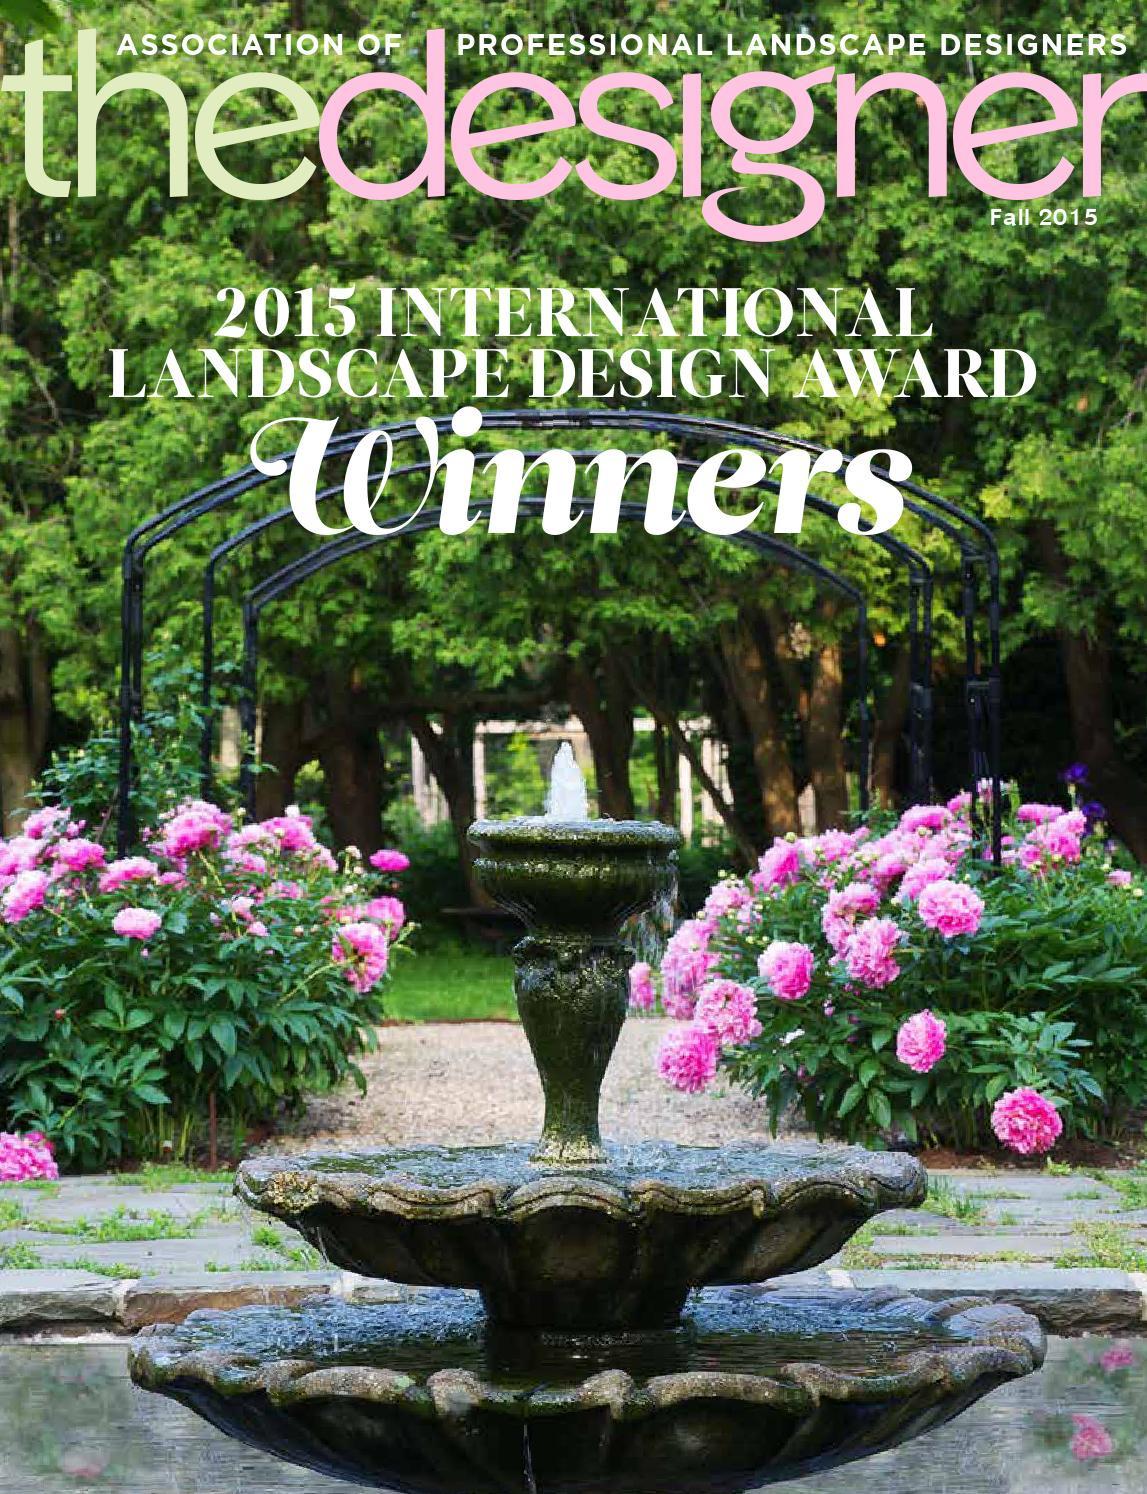 Association Of Professional Landscape Designers  The Designer – Fall 2015 by Association of Professional